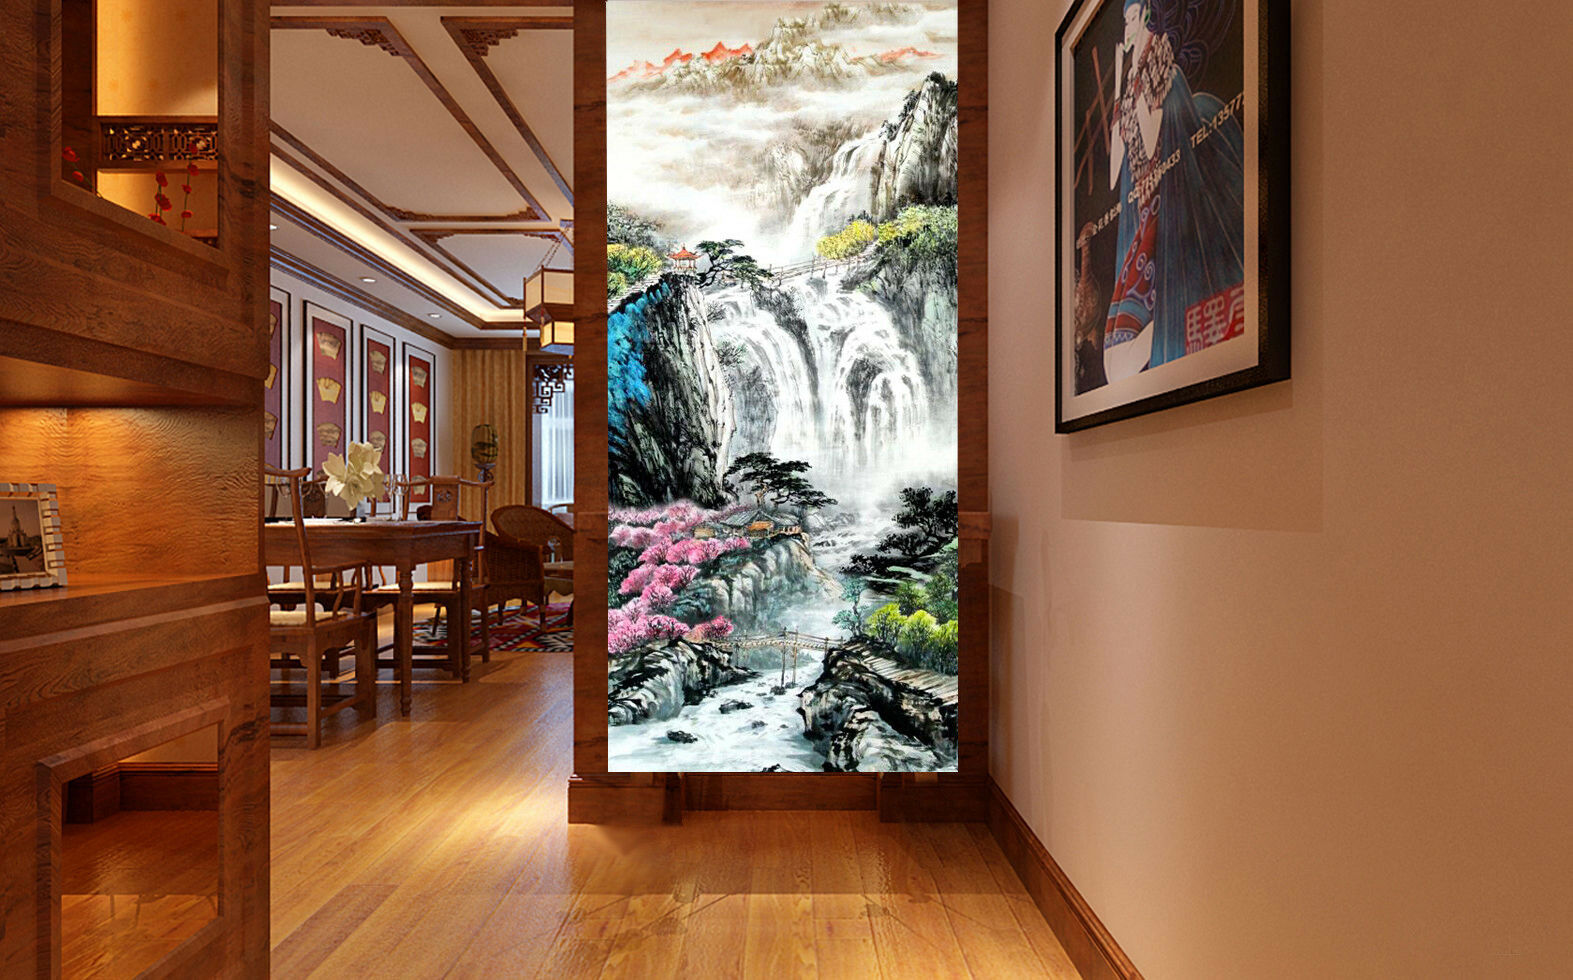 3D Waterfall Scenery 8 Wall Paper Murals Wall Print Wall Wallpaper Mural AU Kyra